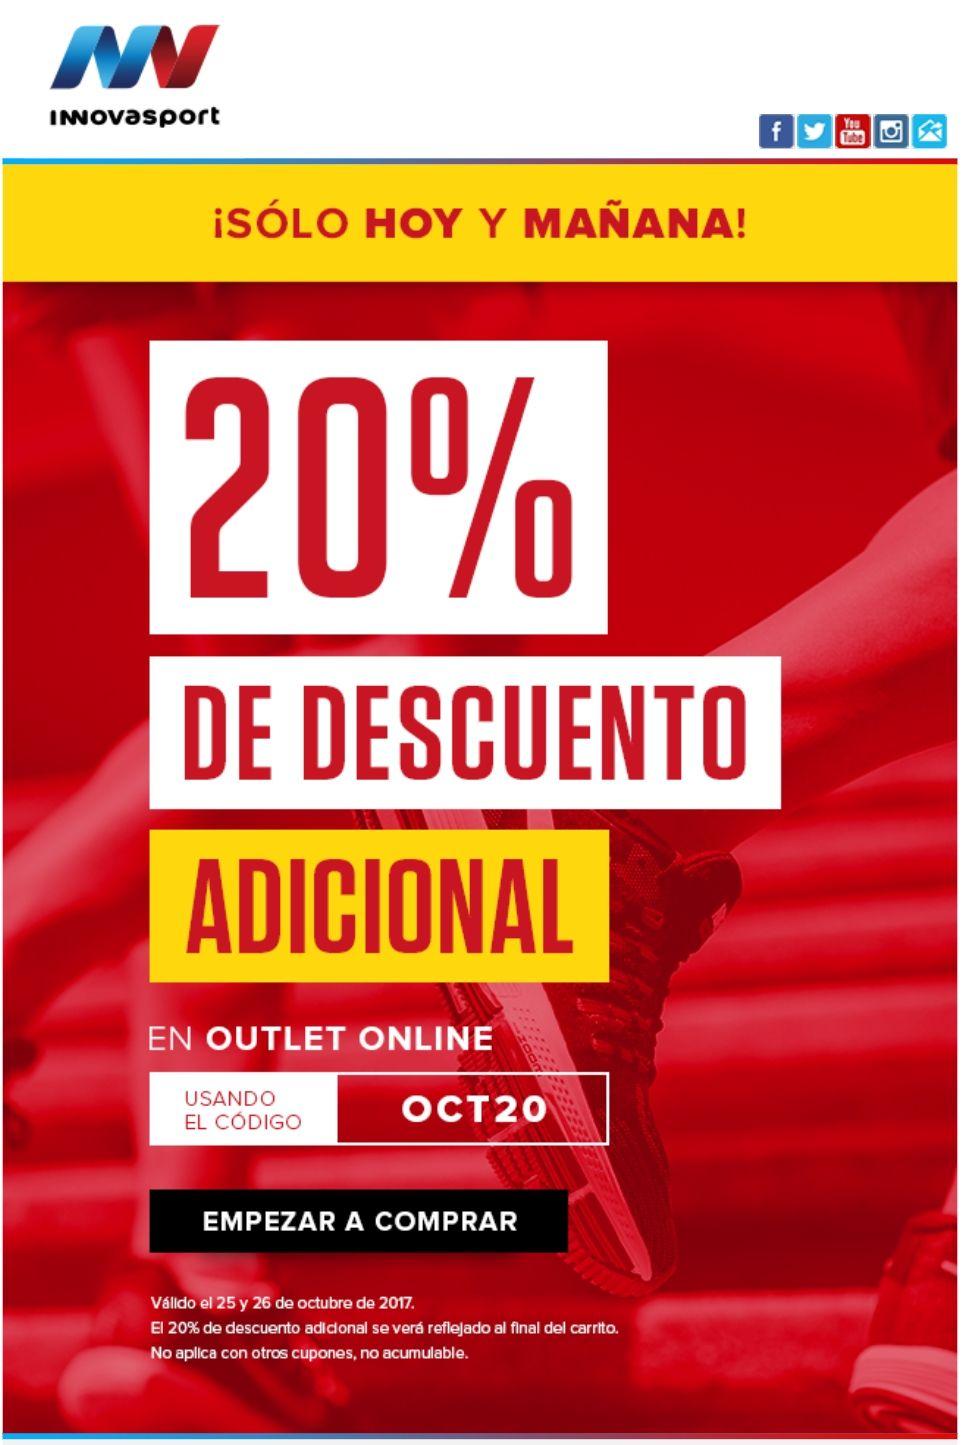 Innovasport: 20% de Descuento adicional en OUTLET